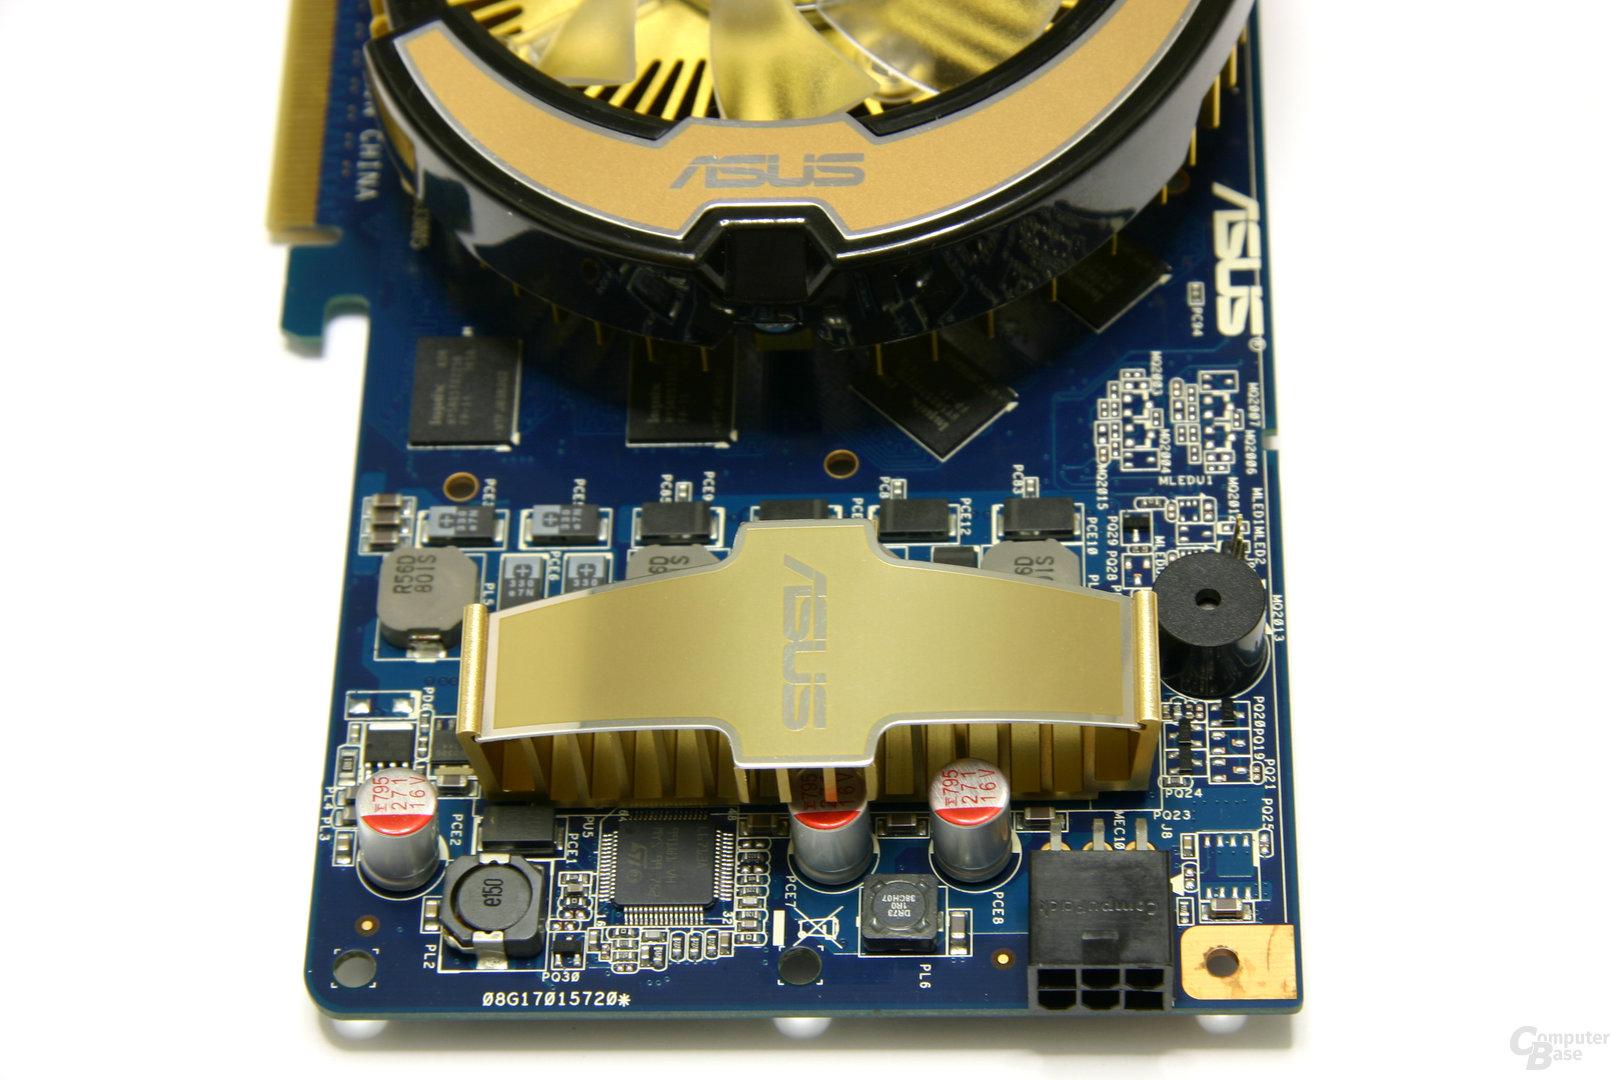 GeForce 8800 GT 256 MB Spannungswandler